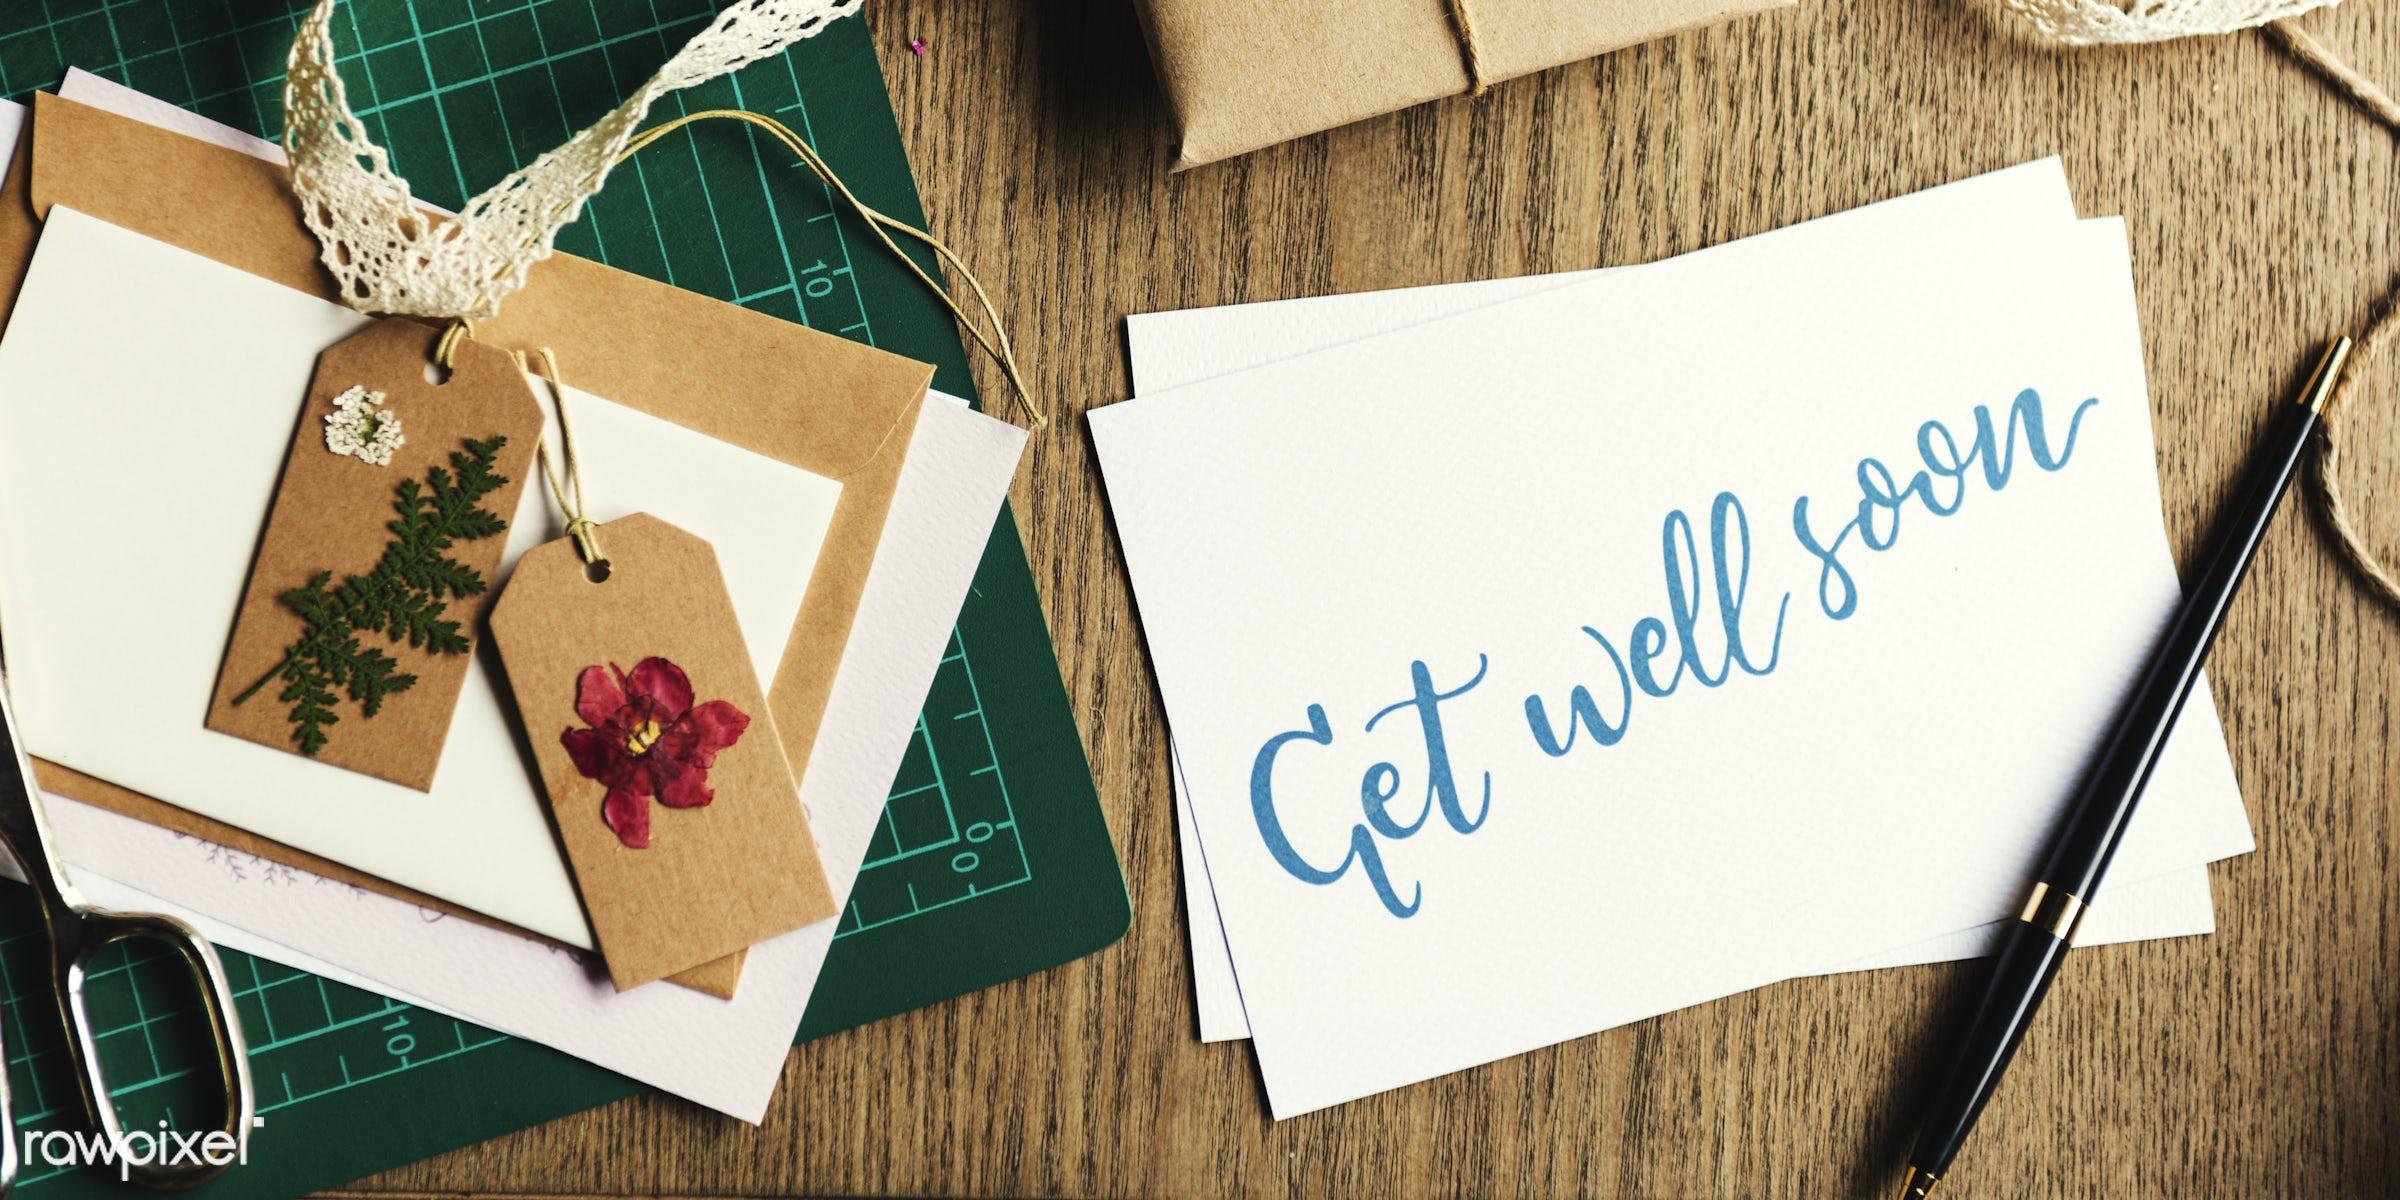 nobody, gift, detail, decorative, wish, handicraft, writing, show, well, dried, attractive, written, write, wooden...